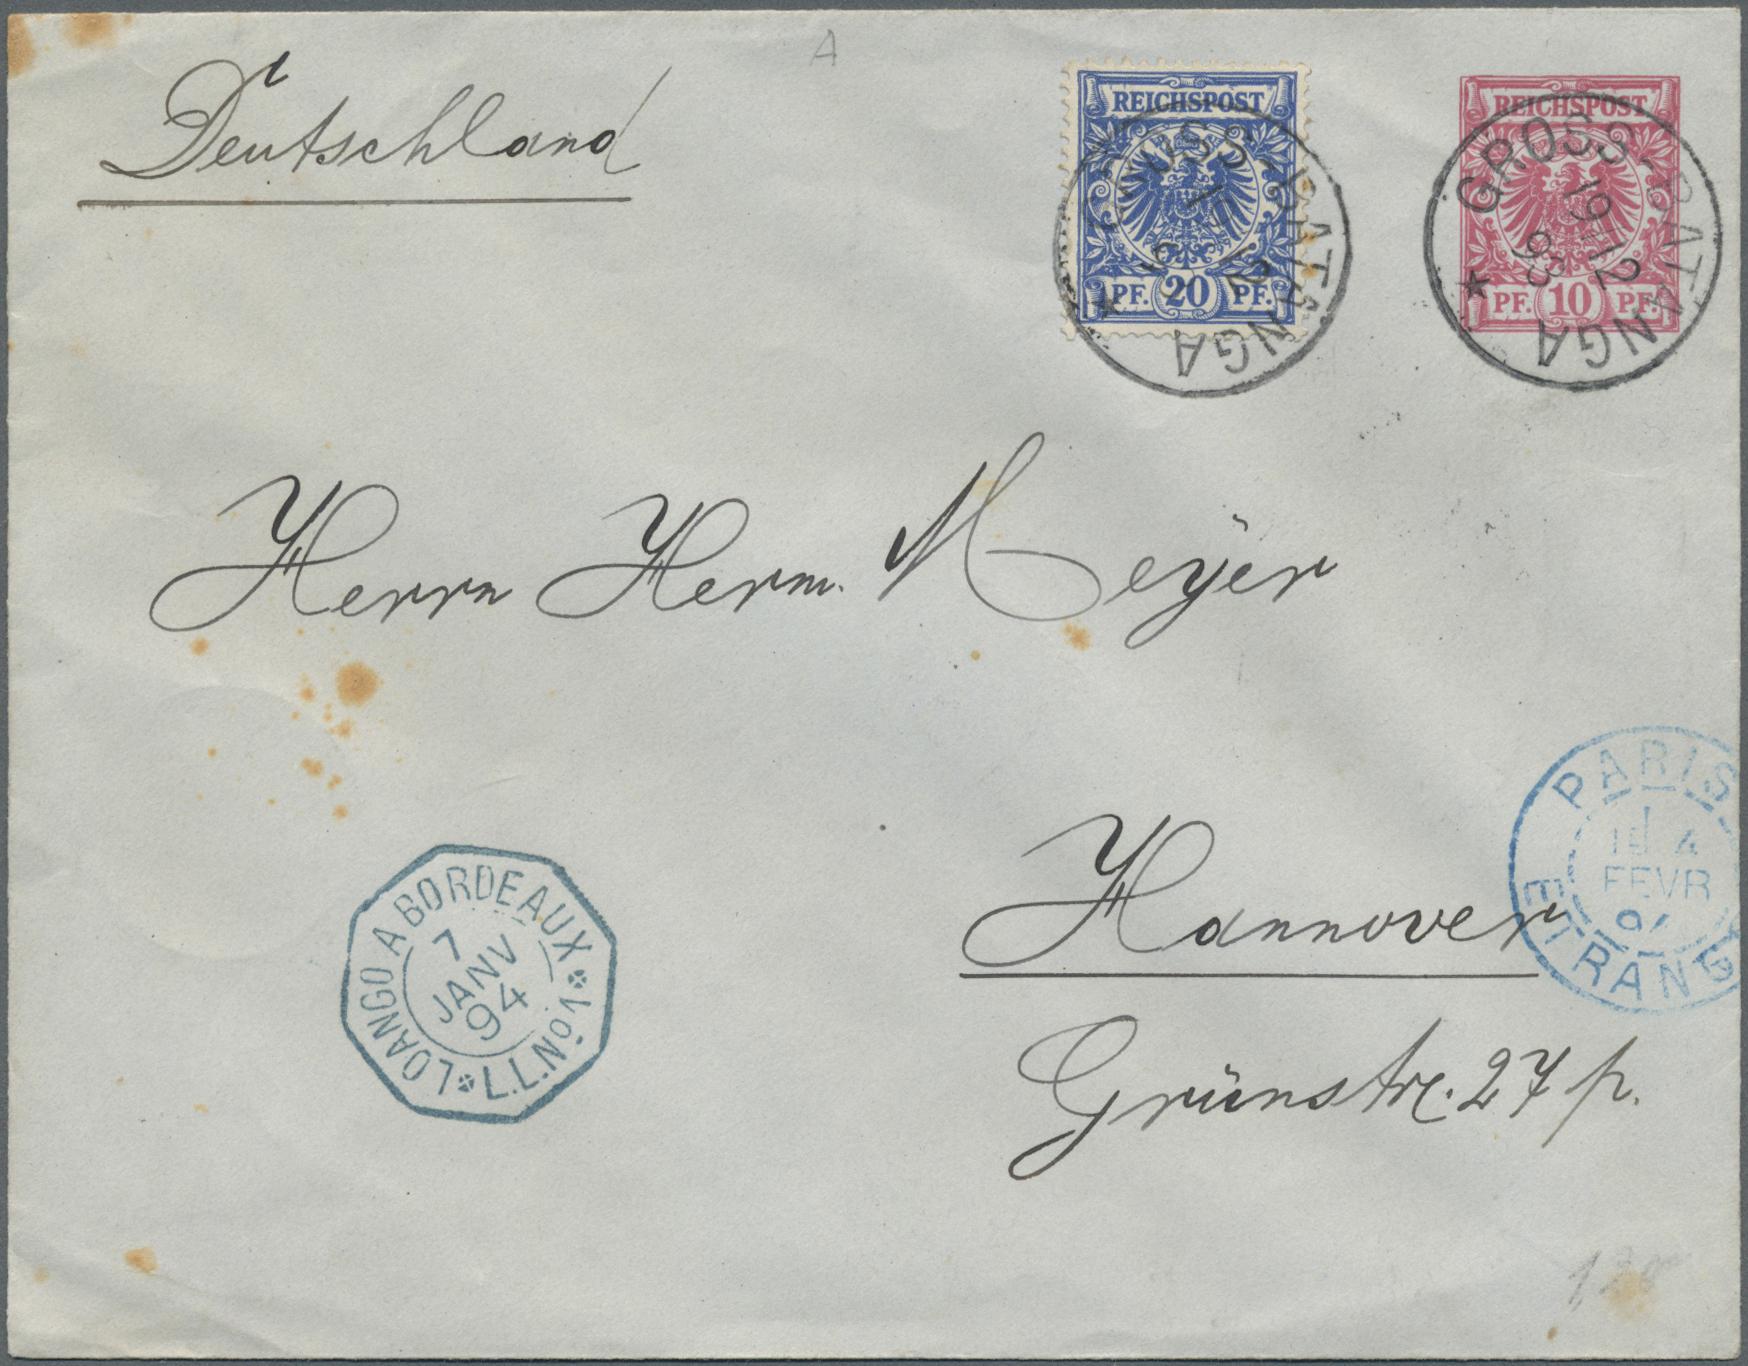 Lot 22433 - Deutsche Kolonien - Kamerun - Stempel  -  Auktionshaus Christoph Gärtner GmbH & Co. KG Single lots Germany + Picture Postcards. Auction #39 Day 5